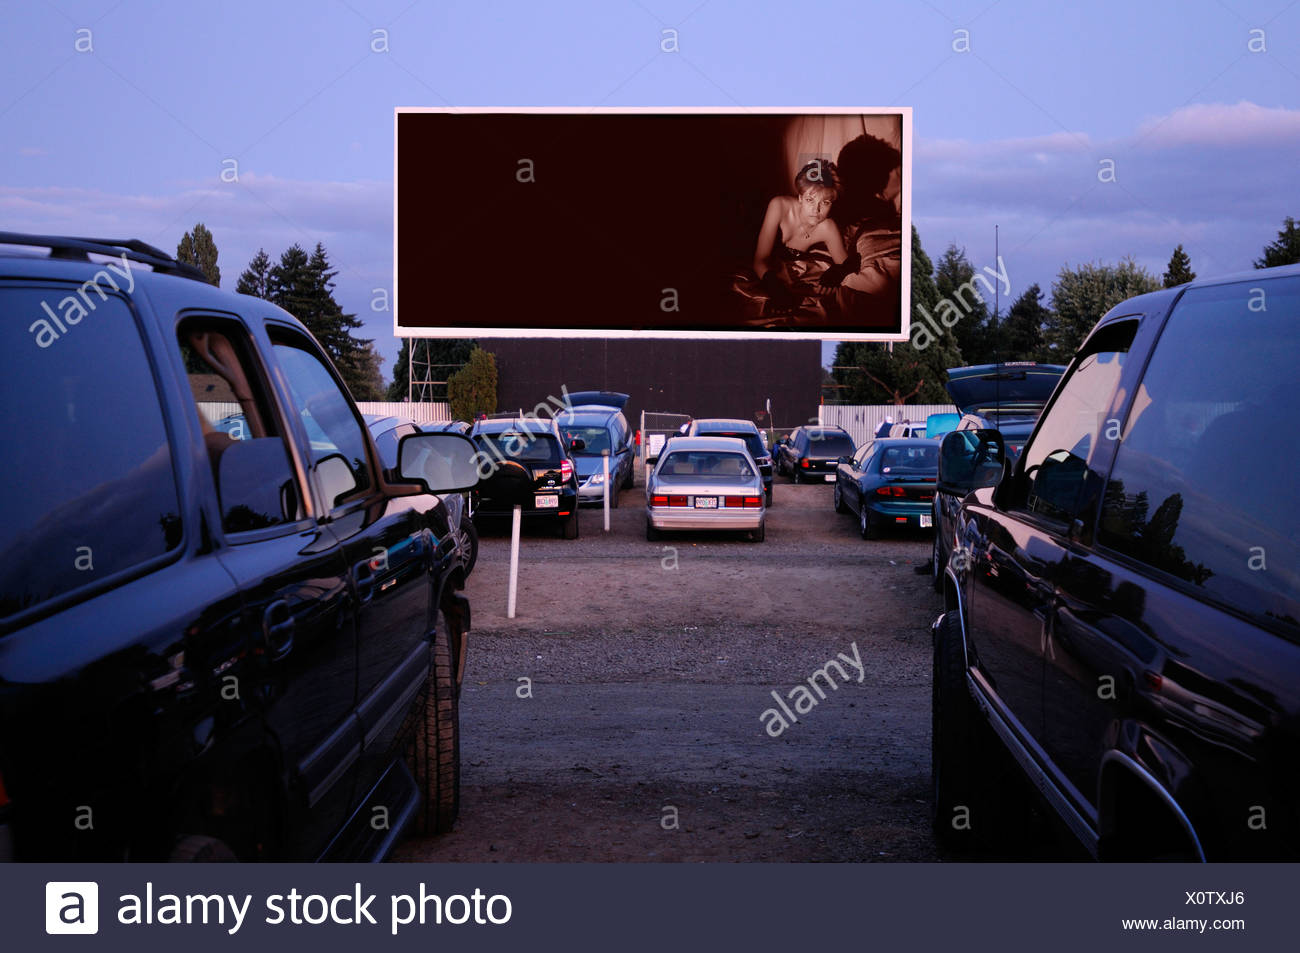 Motor Vu Drive In Dallas Oregon USA cinema parking cars - Stock Image